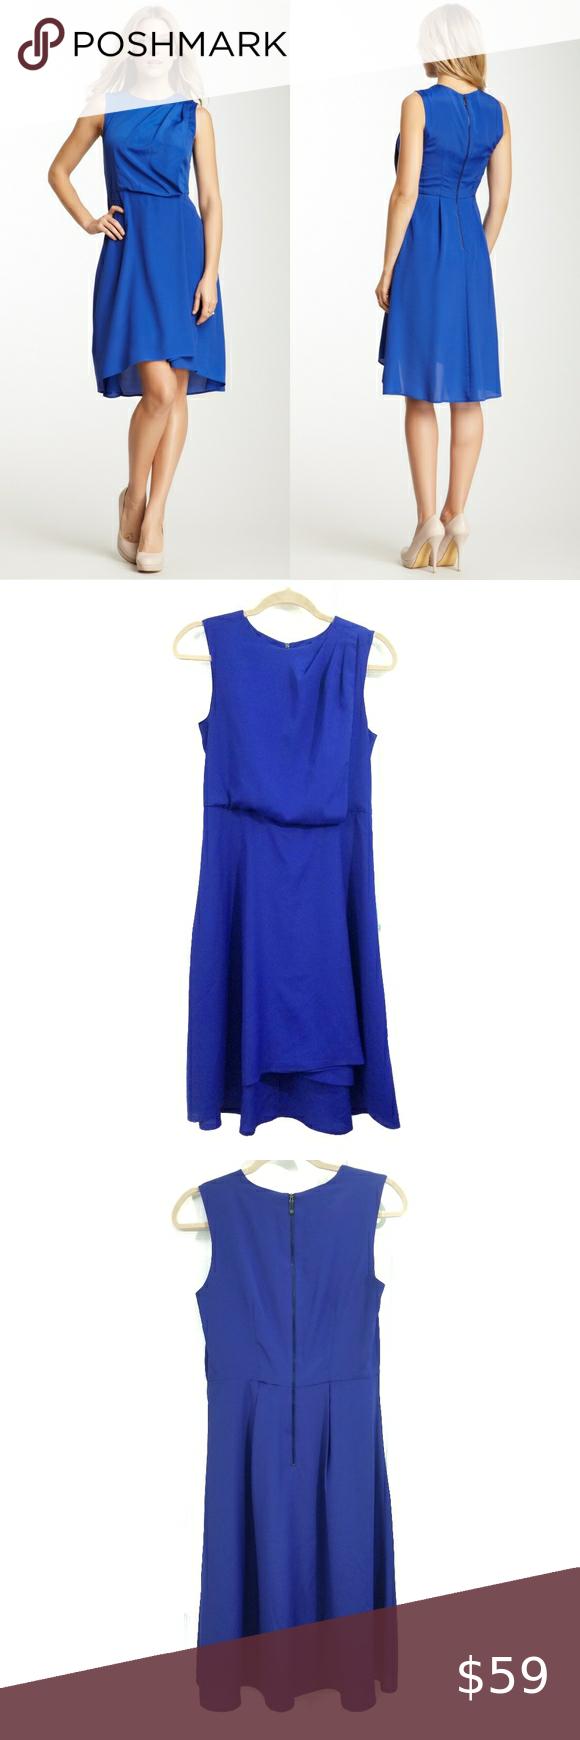 Vince Camuto Sleeveless Pleated Cobalt Dress Gorgeous Sleeveless Dress In Striking Bright C Cobalt Dress Cobalt Blue Cocktail Dress One Shoulder Cocktail Dress [ 1740 x 580 Pixel ]